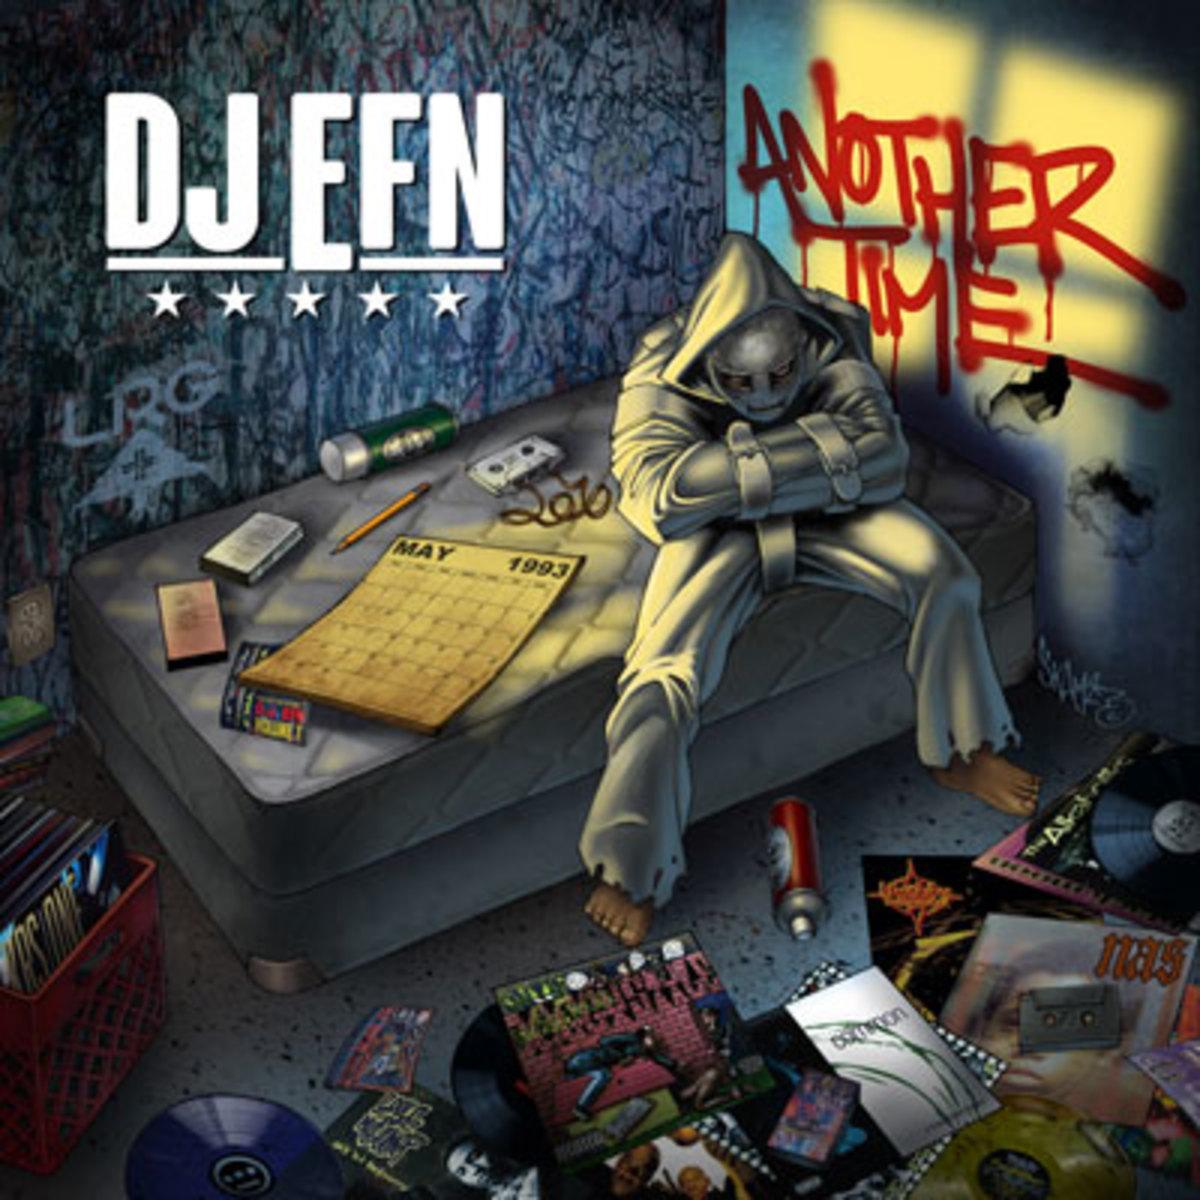 dj-efn-another-time.jpg